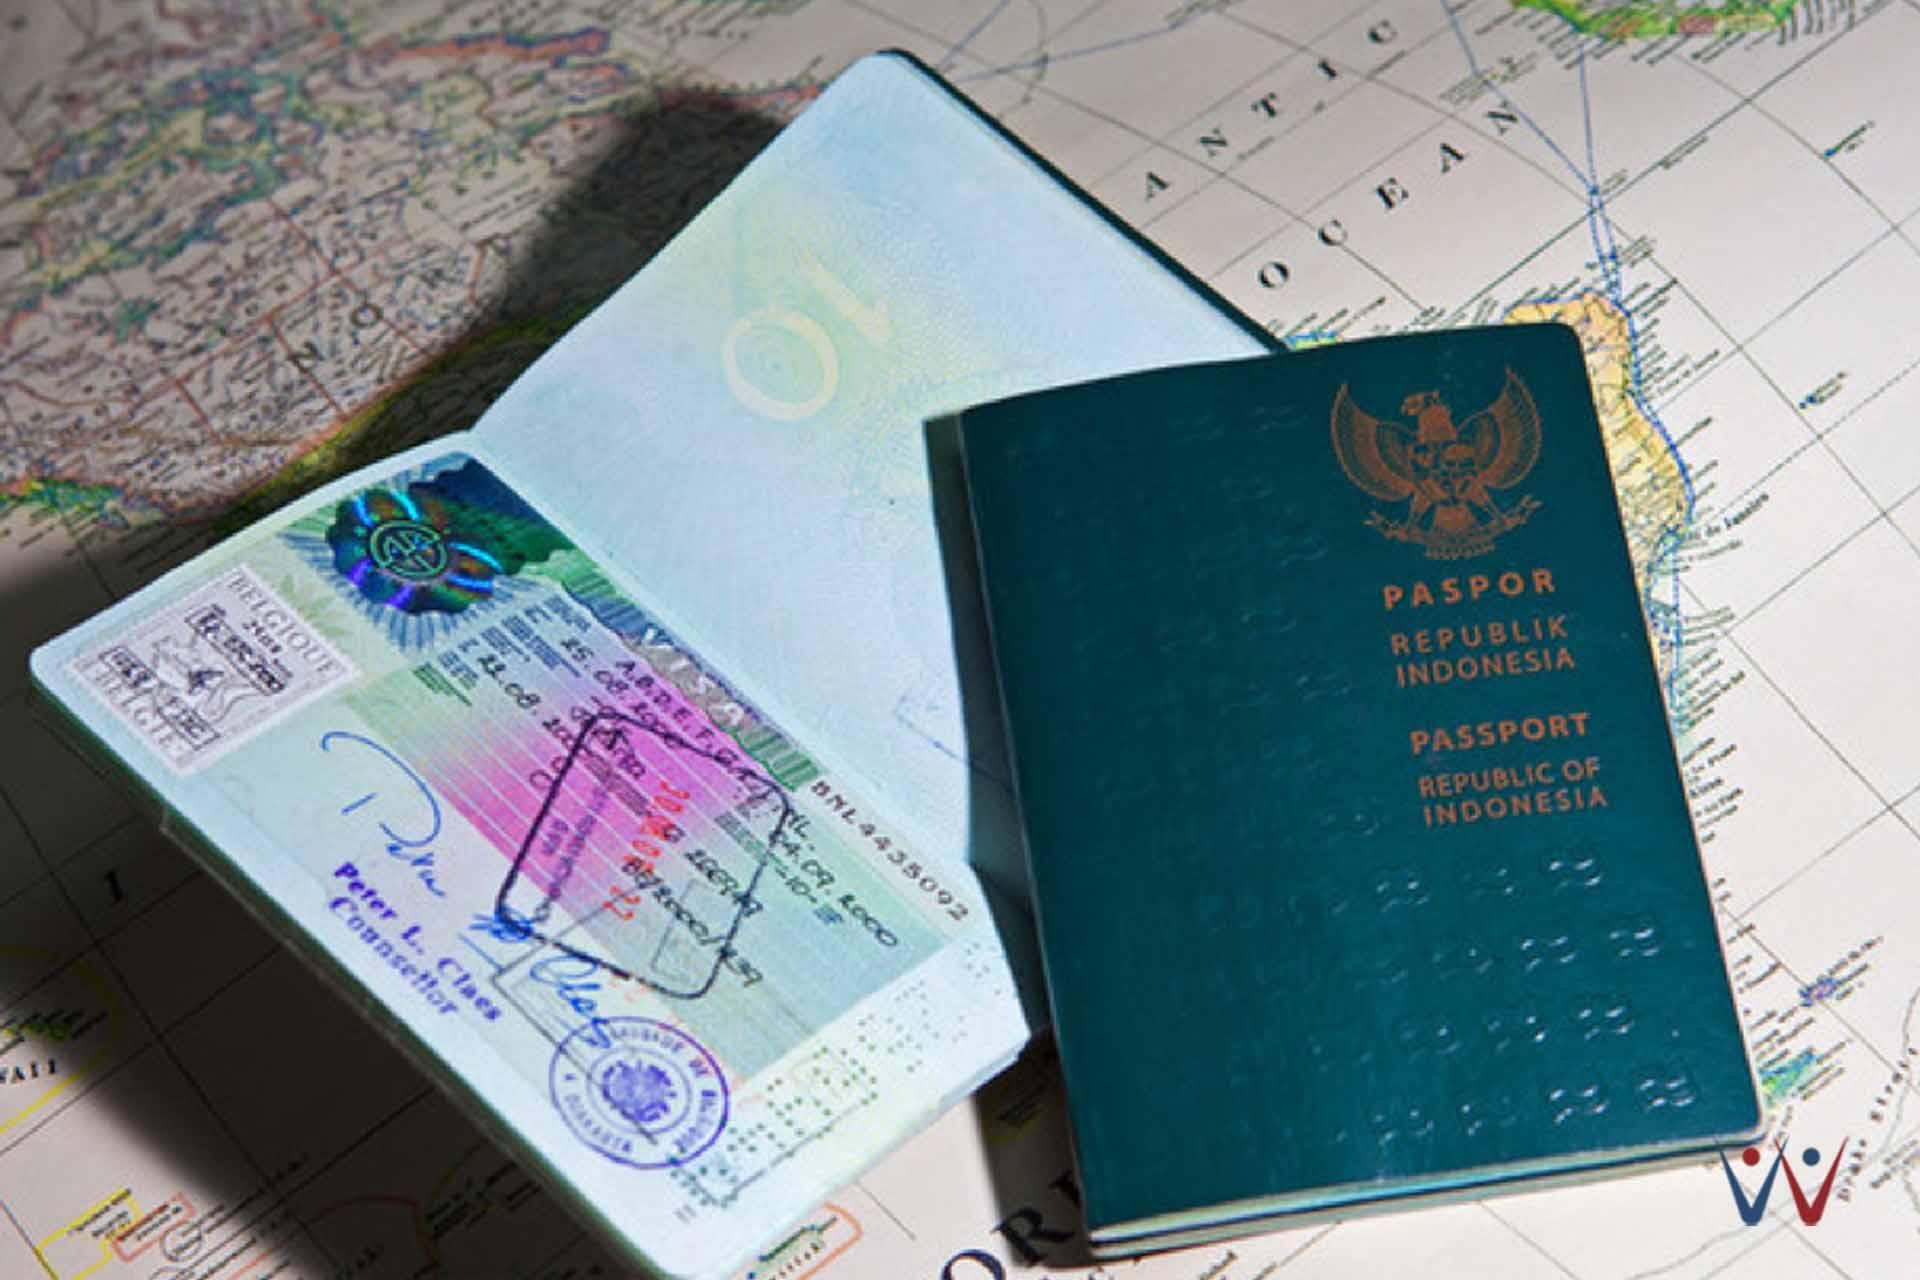 daftar paspor onlien - antrian paspor online - perpanjang paspor online - 3